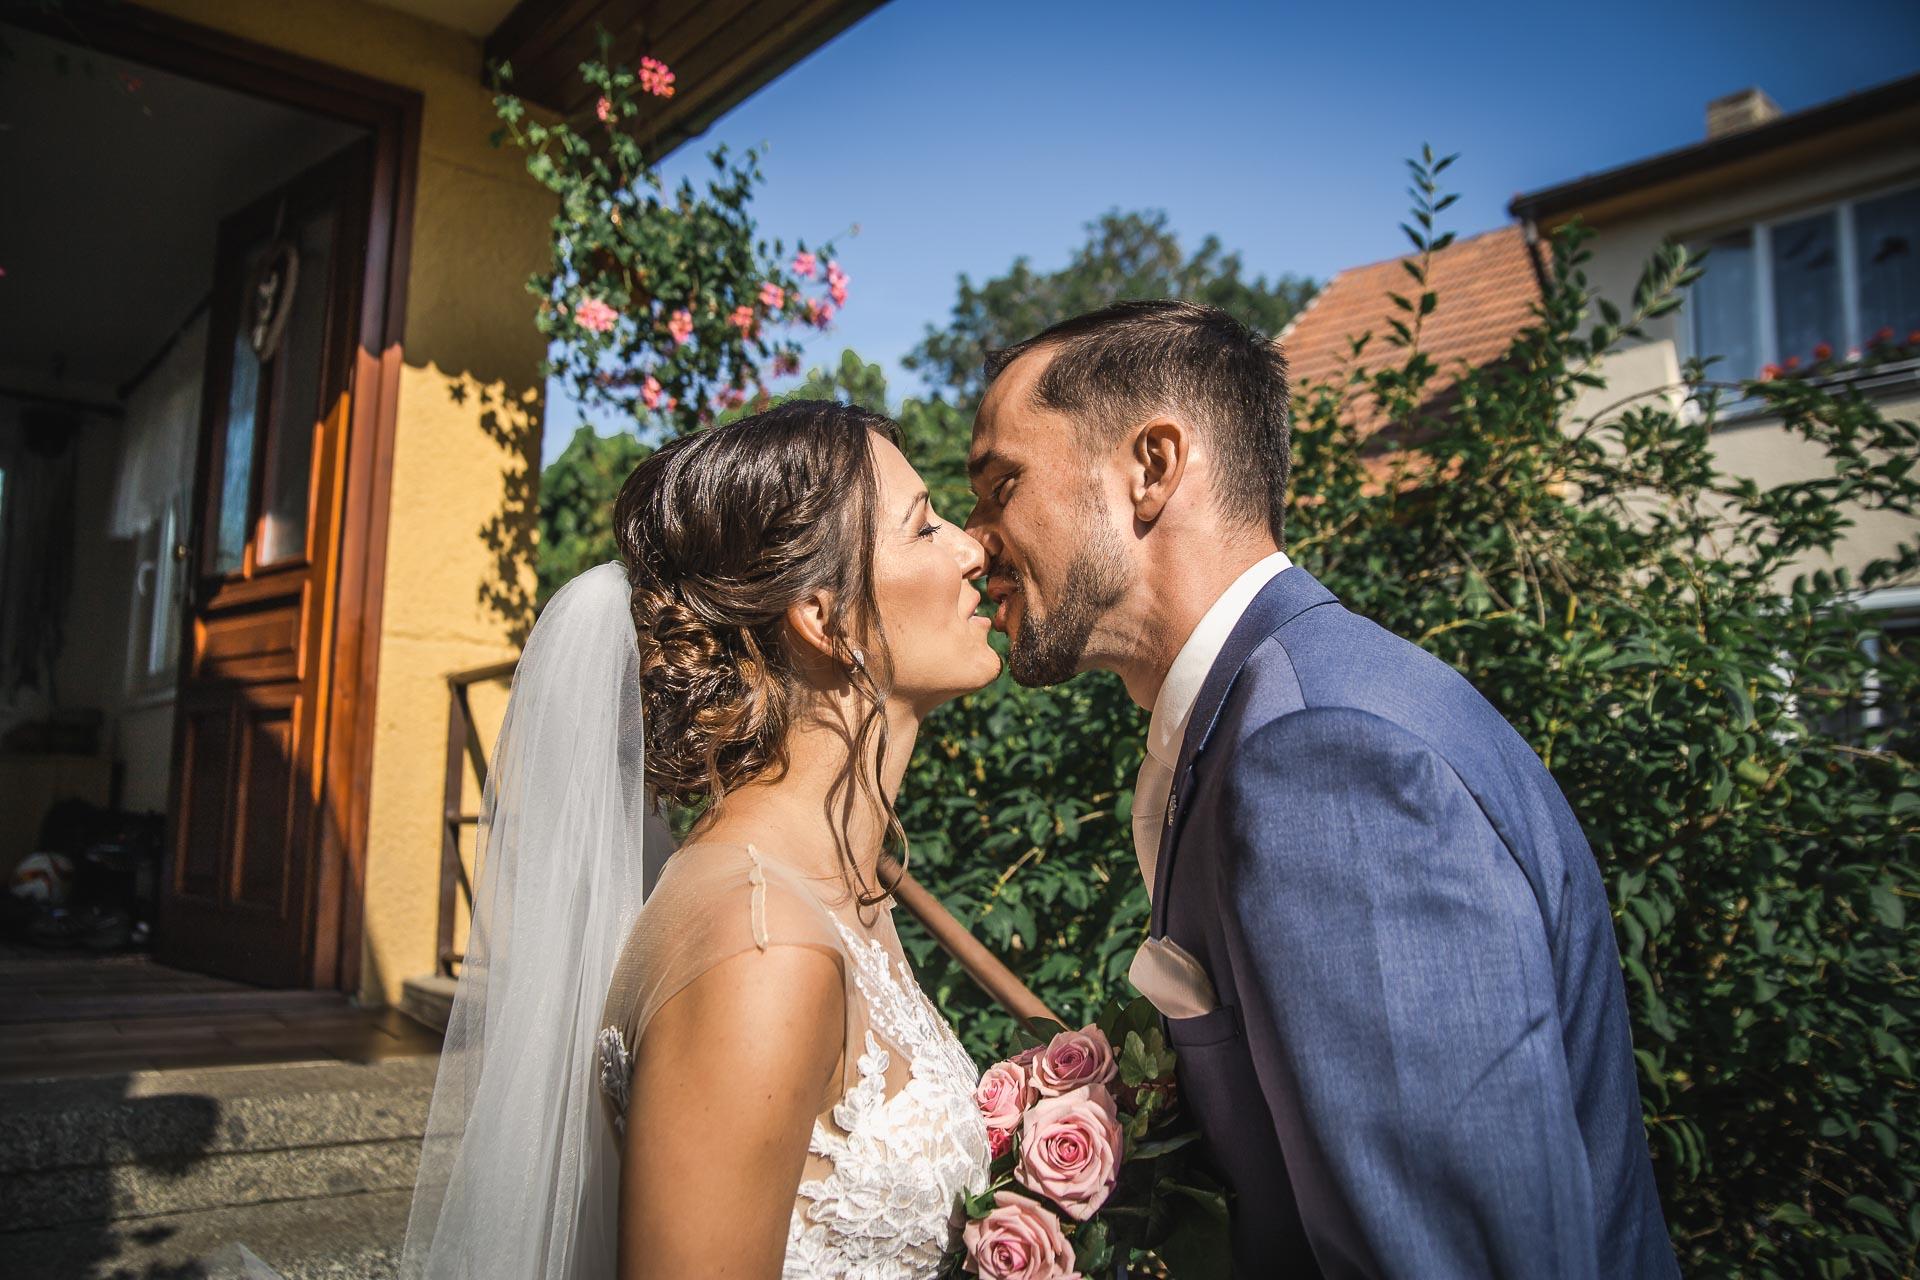 svatební-fotograf-wedding-svatebni-video-orlík-vltava-kostel-statek-stodola-boho-svatba-Beautyfoto-124